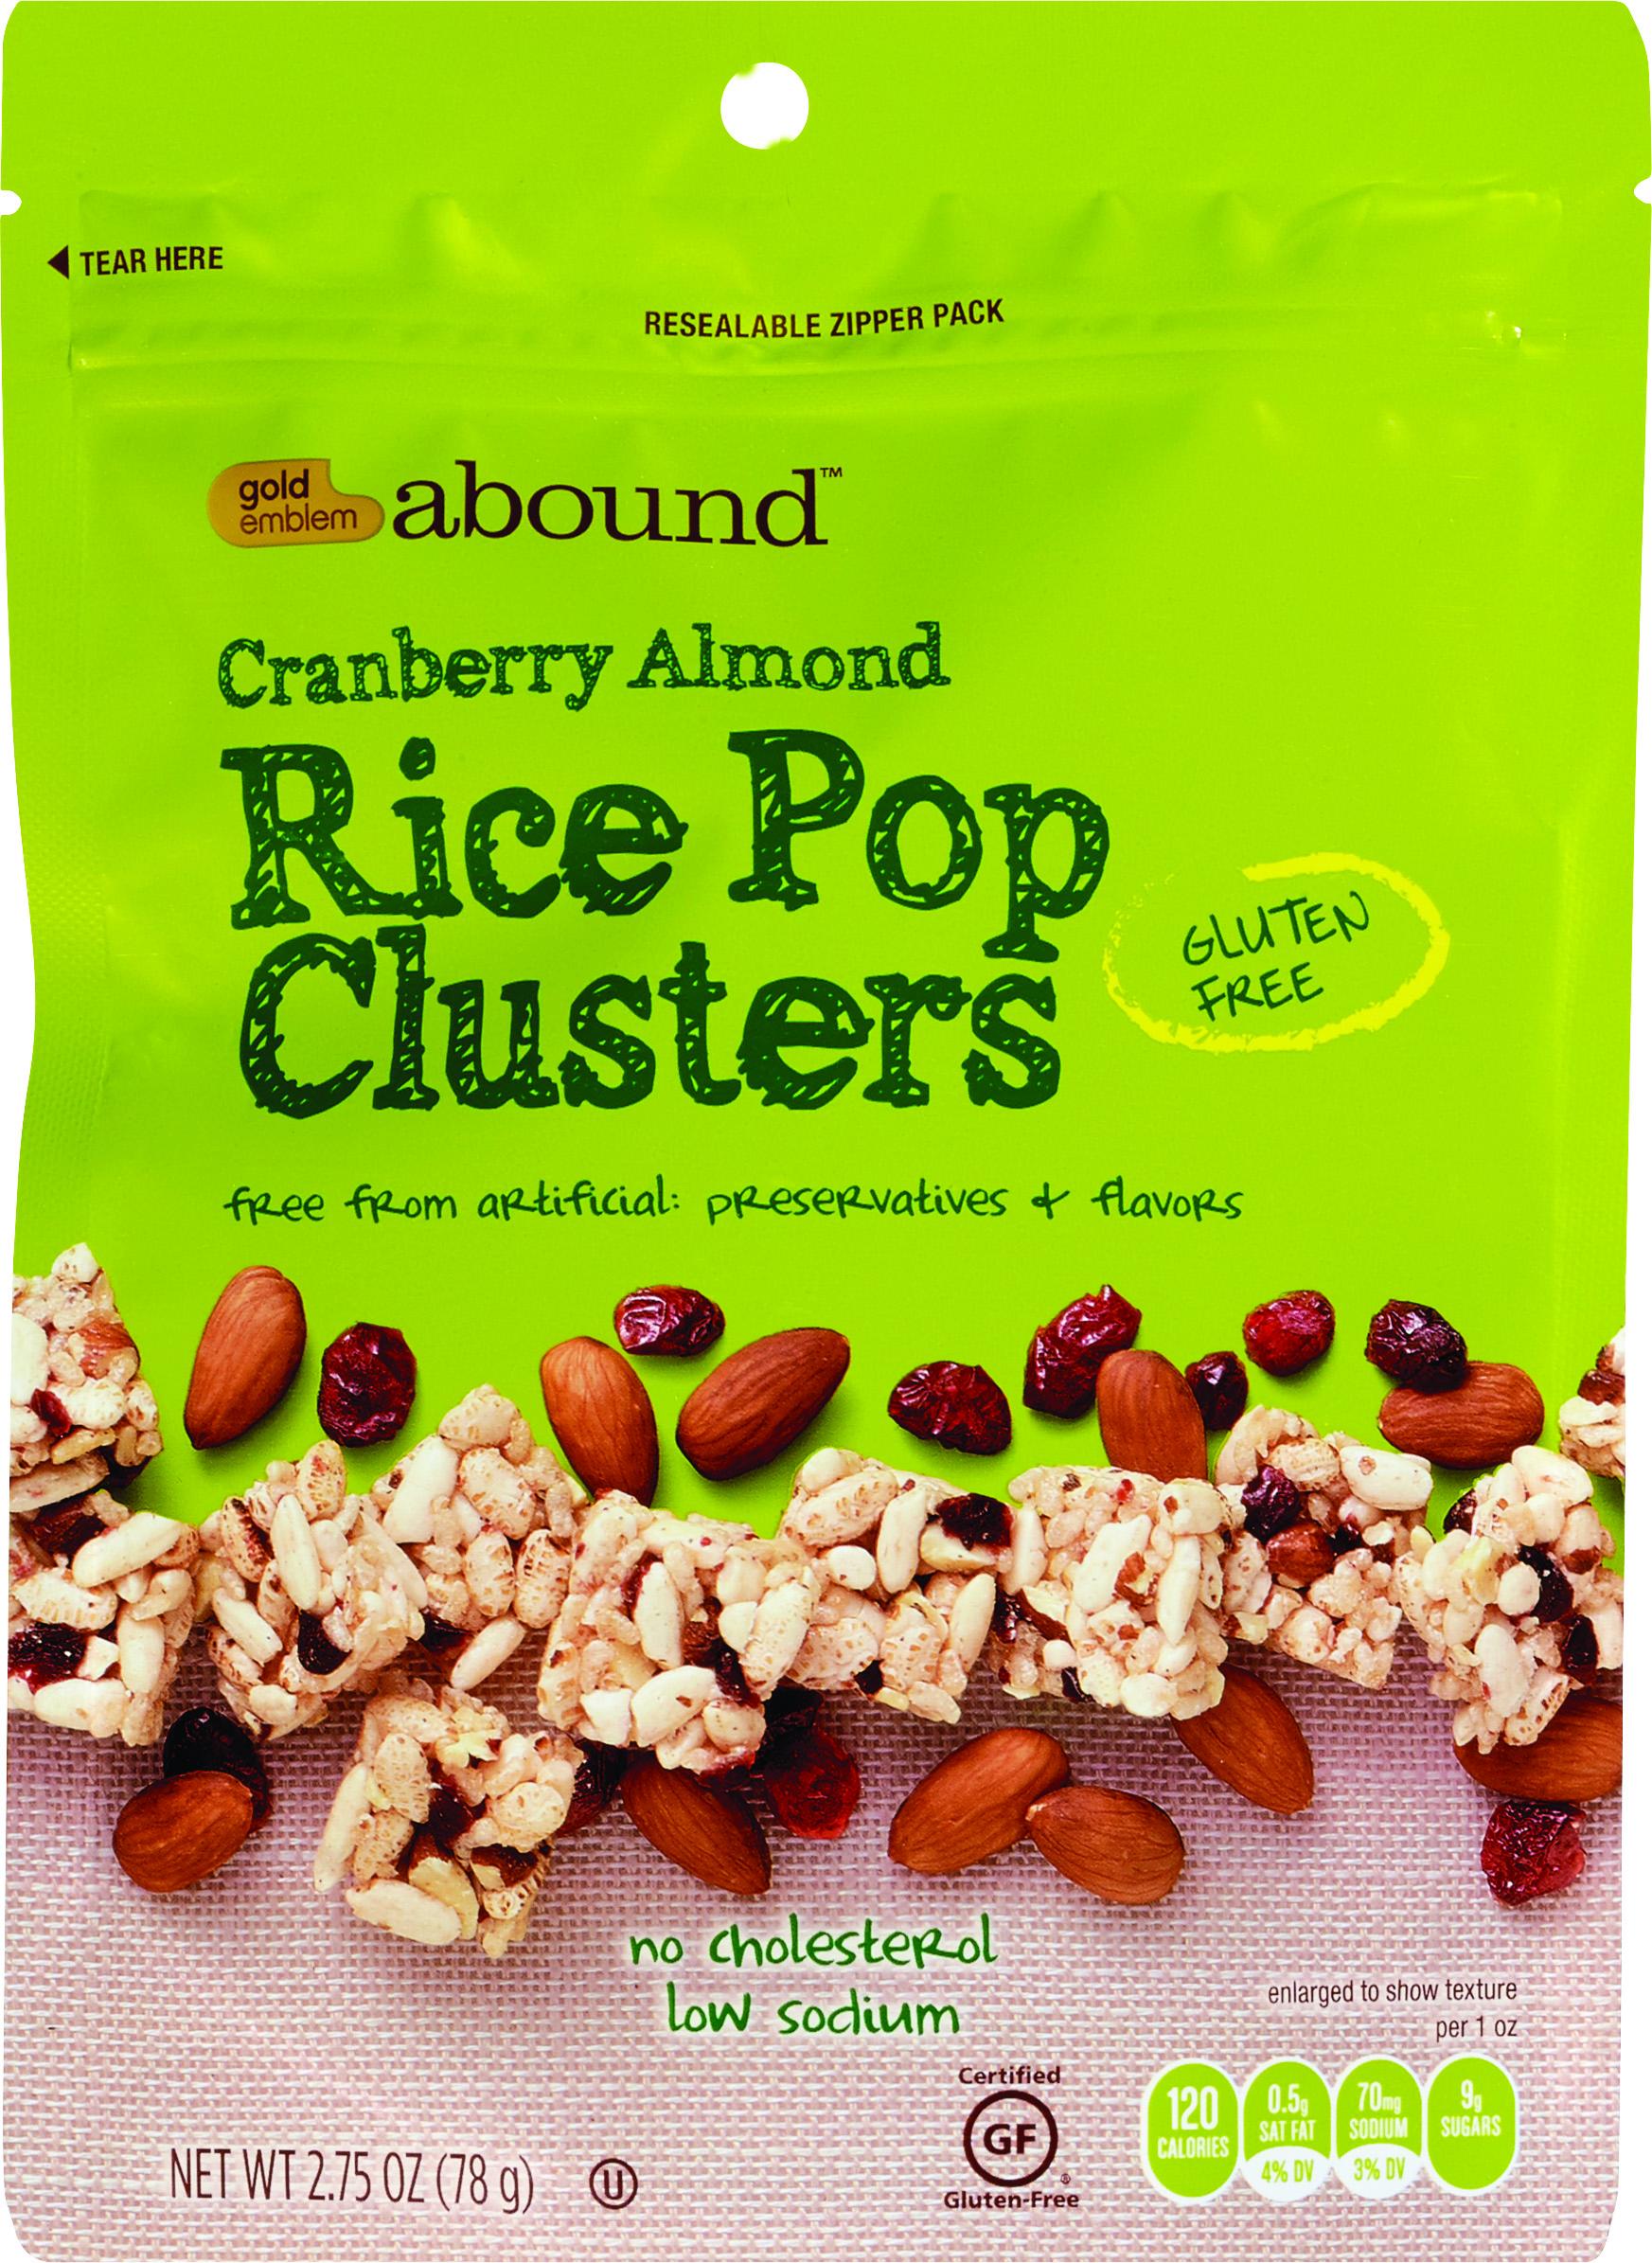 Gold Emblem Abound Cranberry Almond Rice Pop Clusters